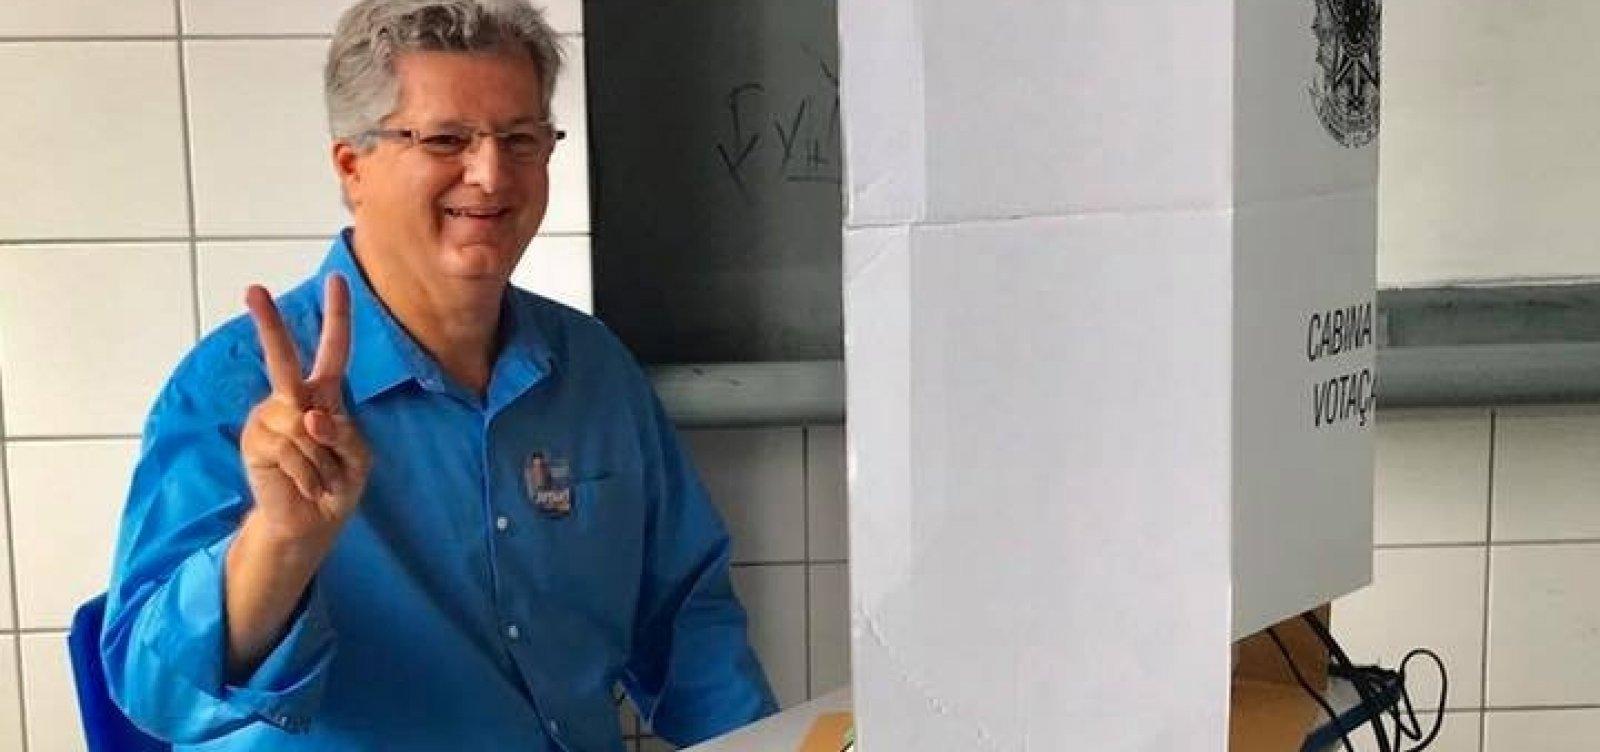 Após derrota, Jutahy Magalhães Júnior decide deixar vida política